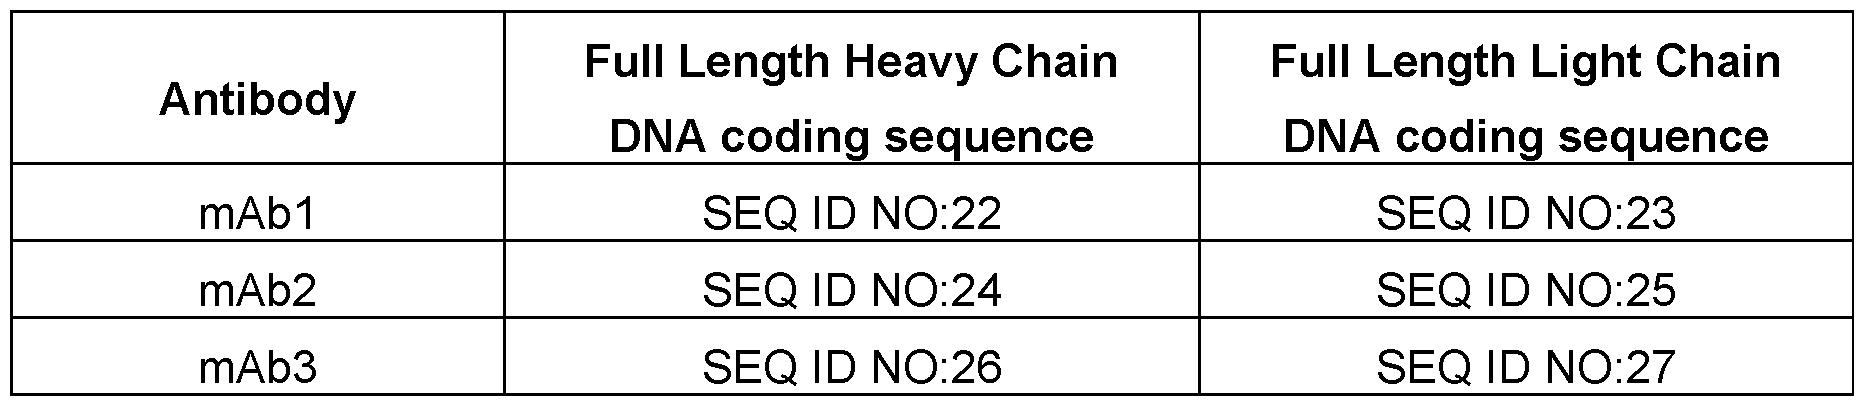 WO2012065950A1 - Silent fc variants of anti-cd40 antibodies - Google